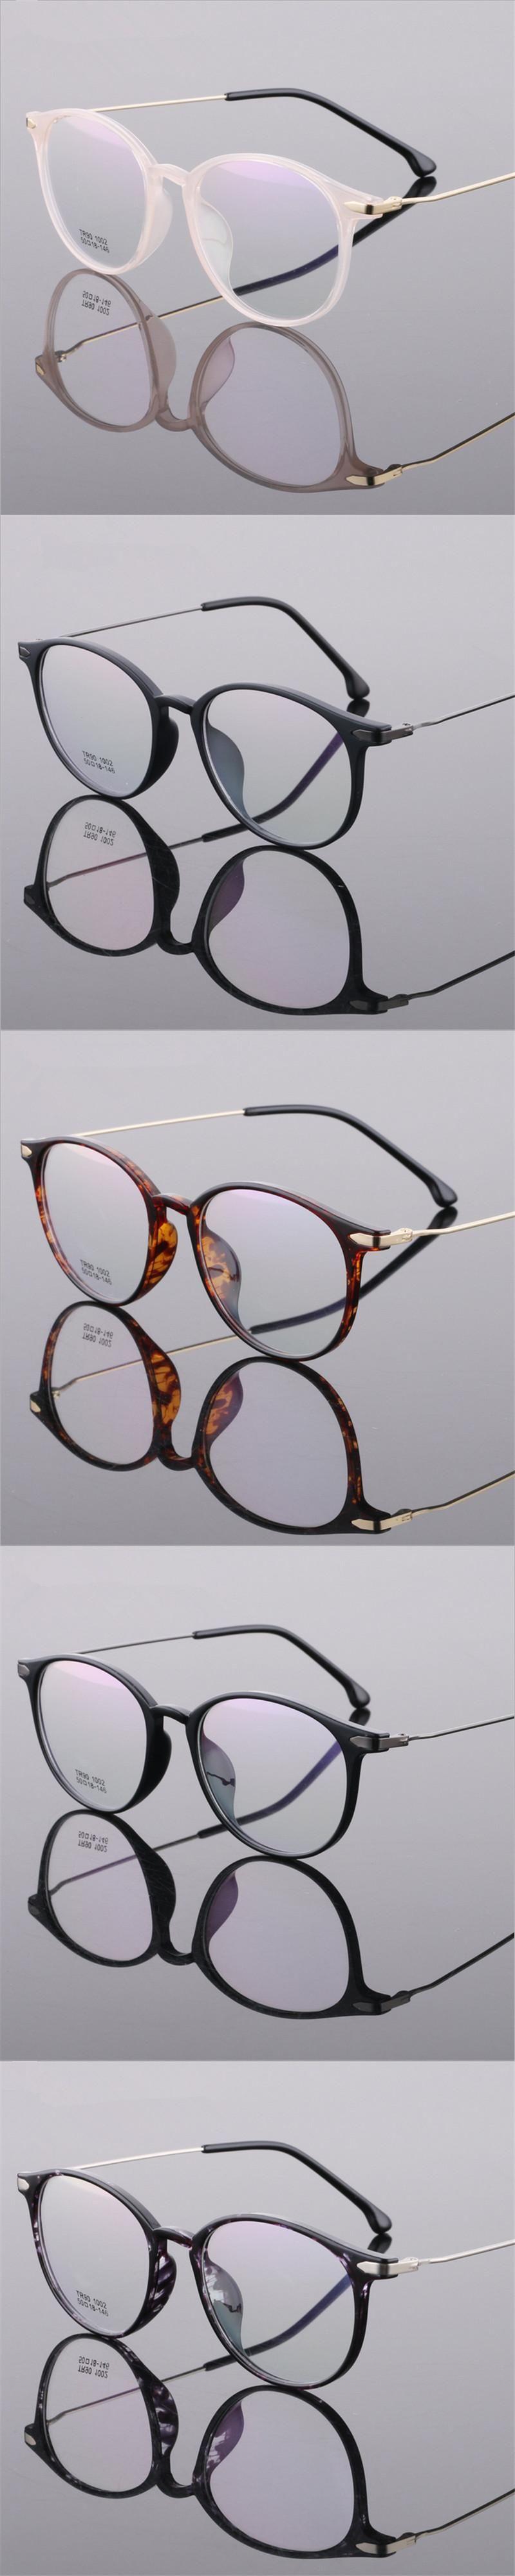 ff343a84b2 Women Men Vintage Round Eyewear Frames Retro Optical Glasses Frame  Eyeglasses Goggle Oculos Ultra-light